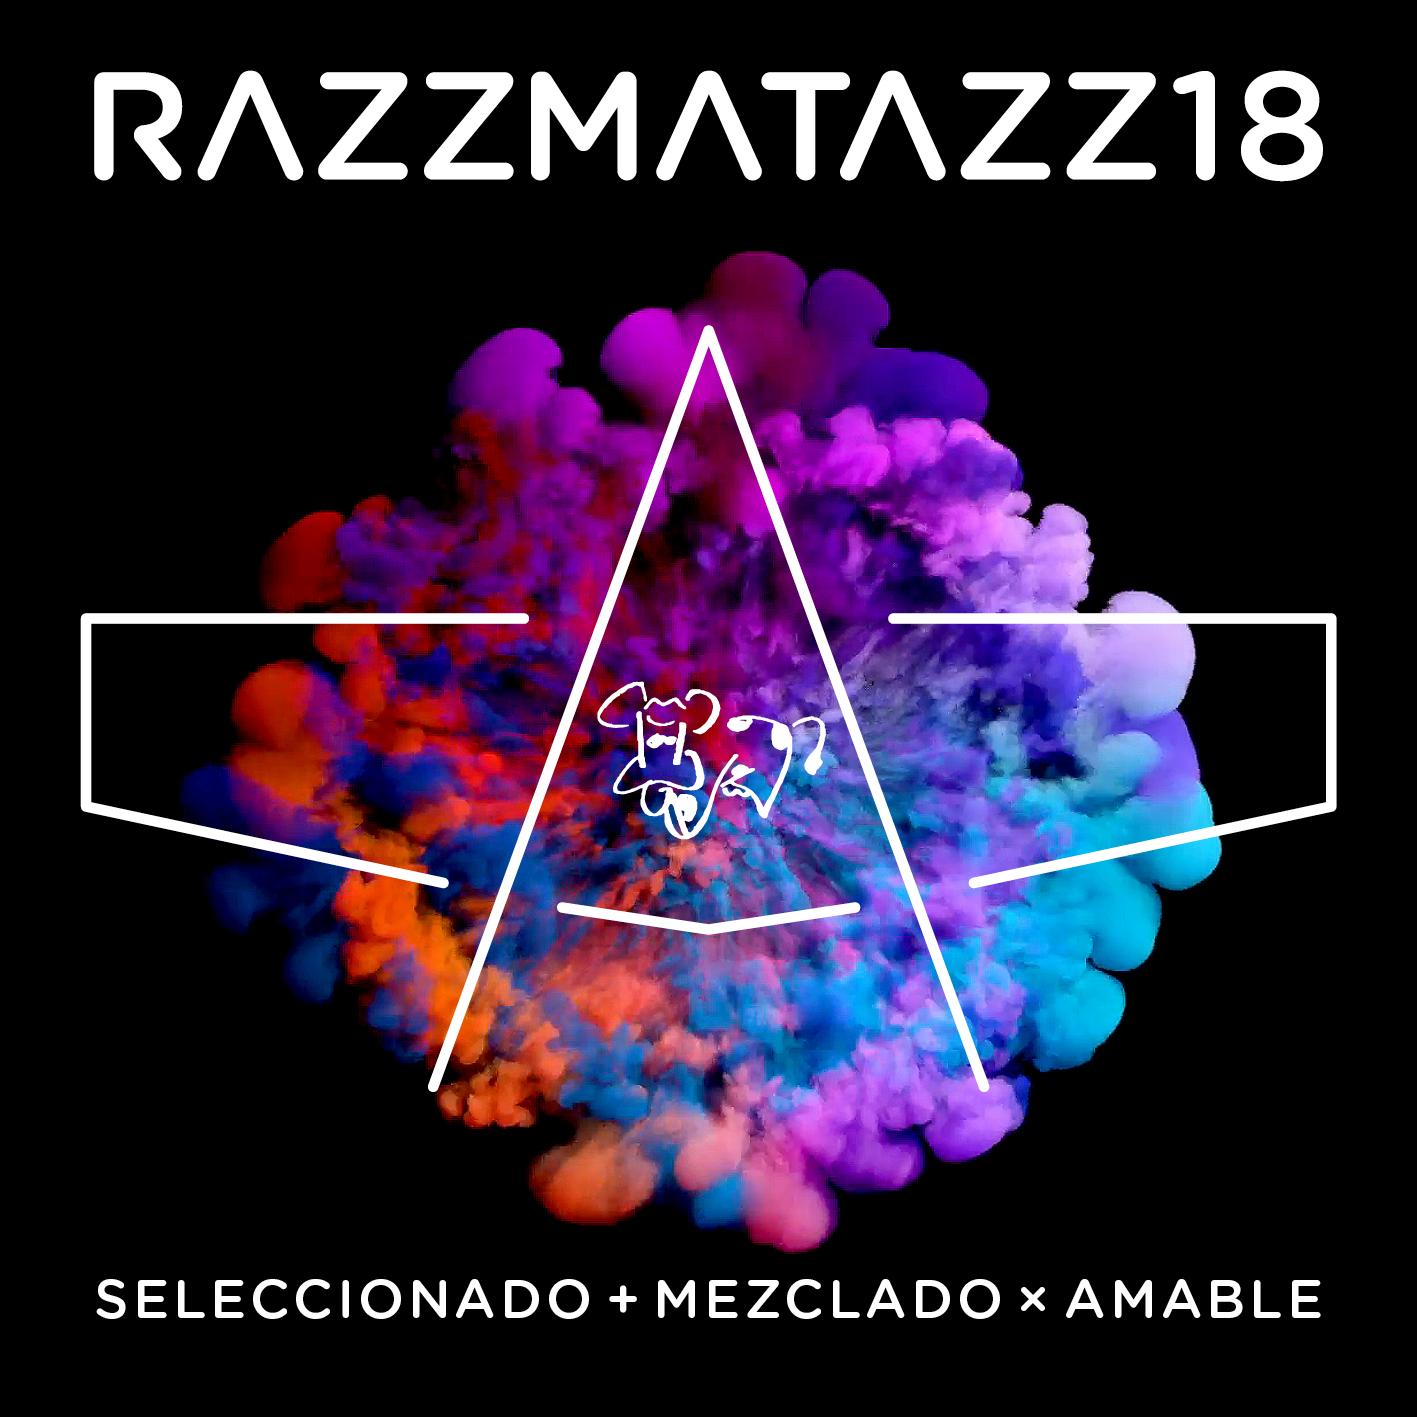 RAZZMATAZZ '18